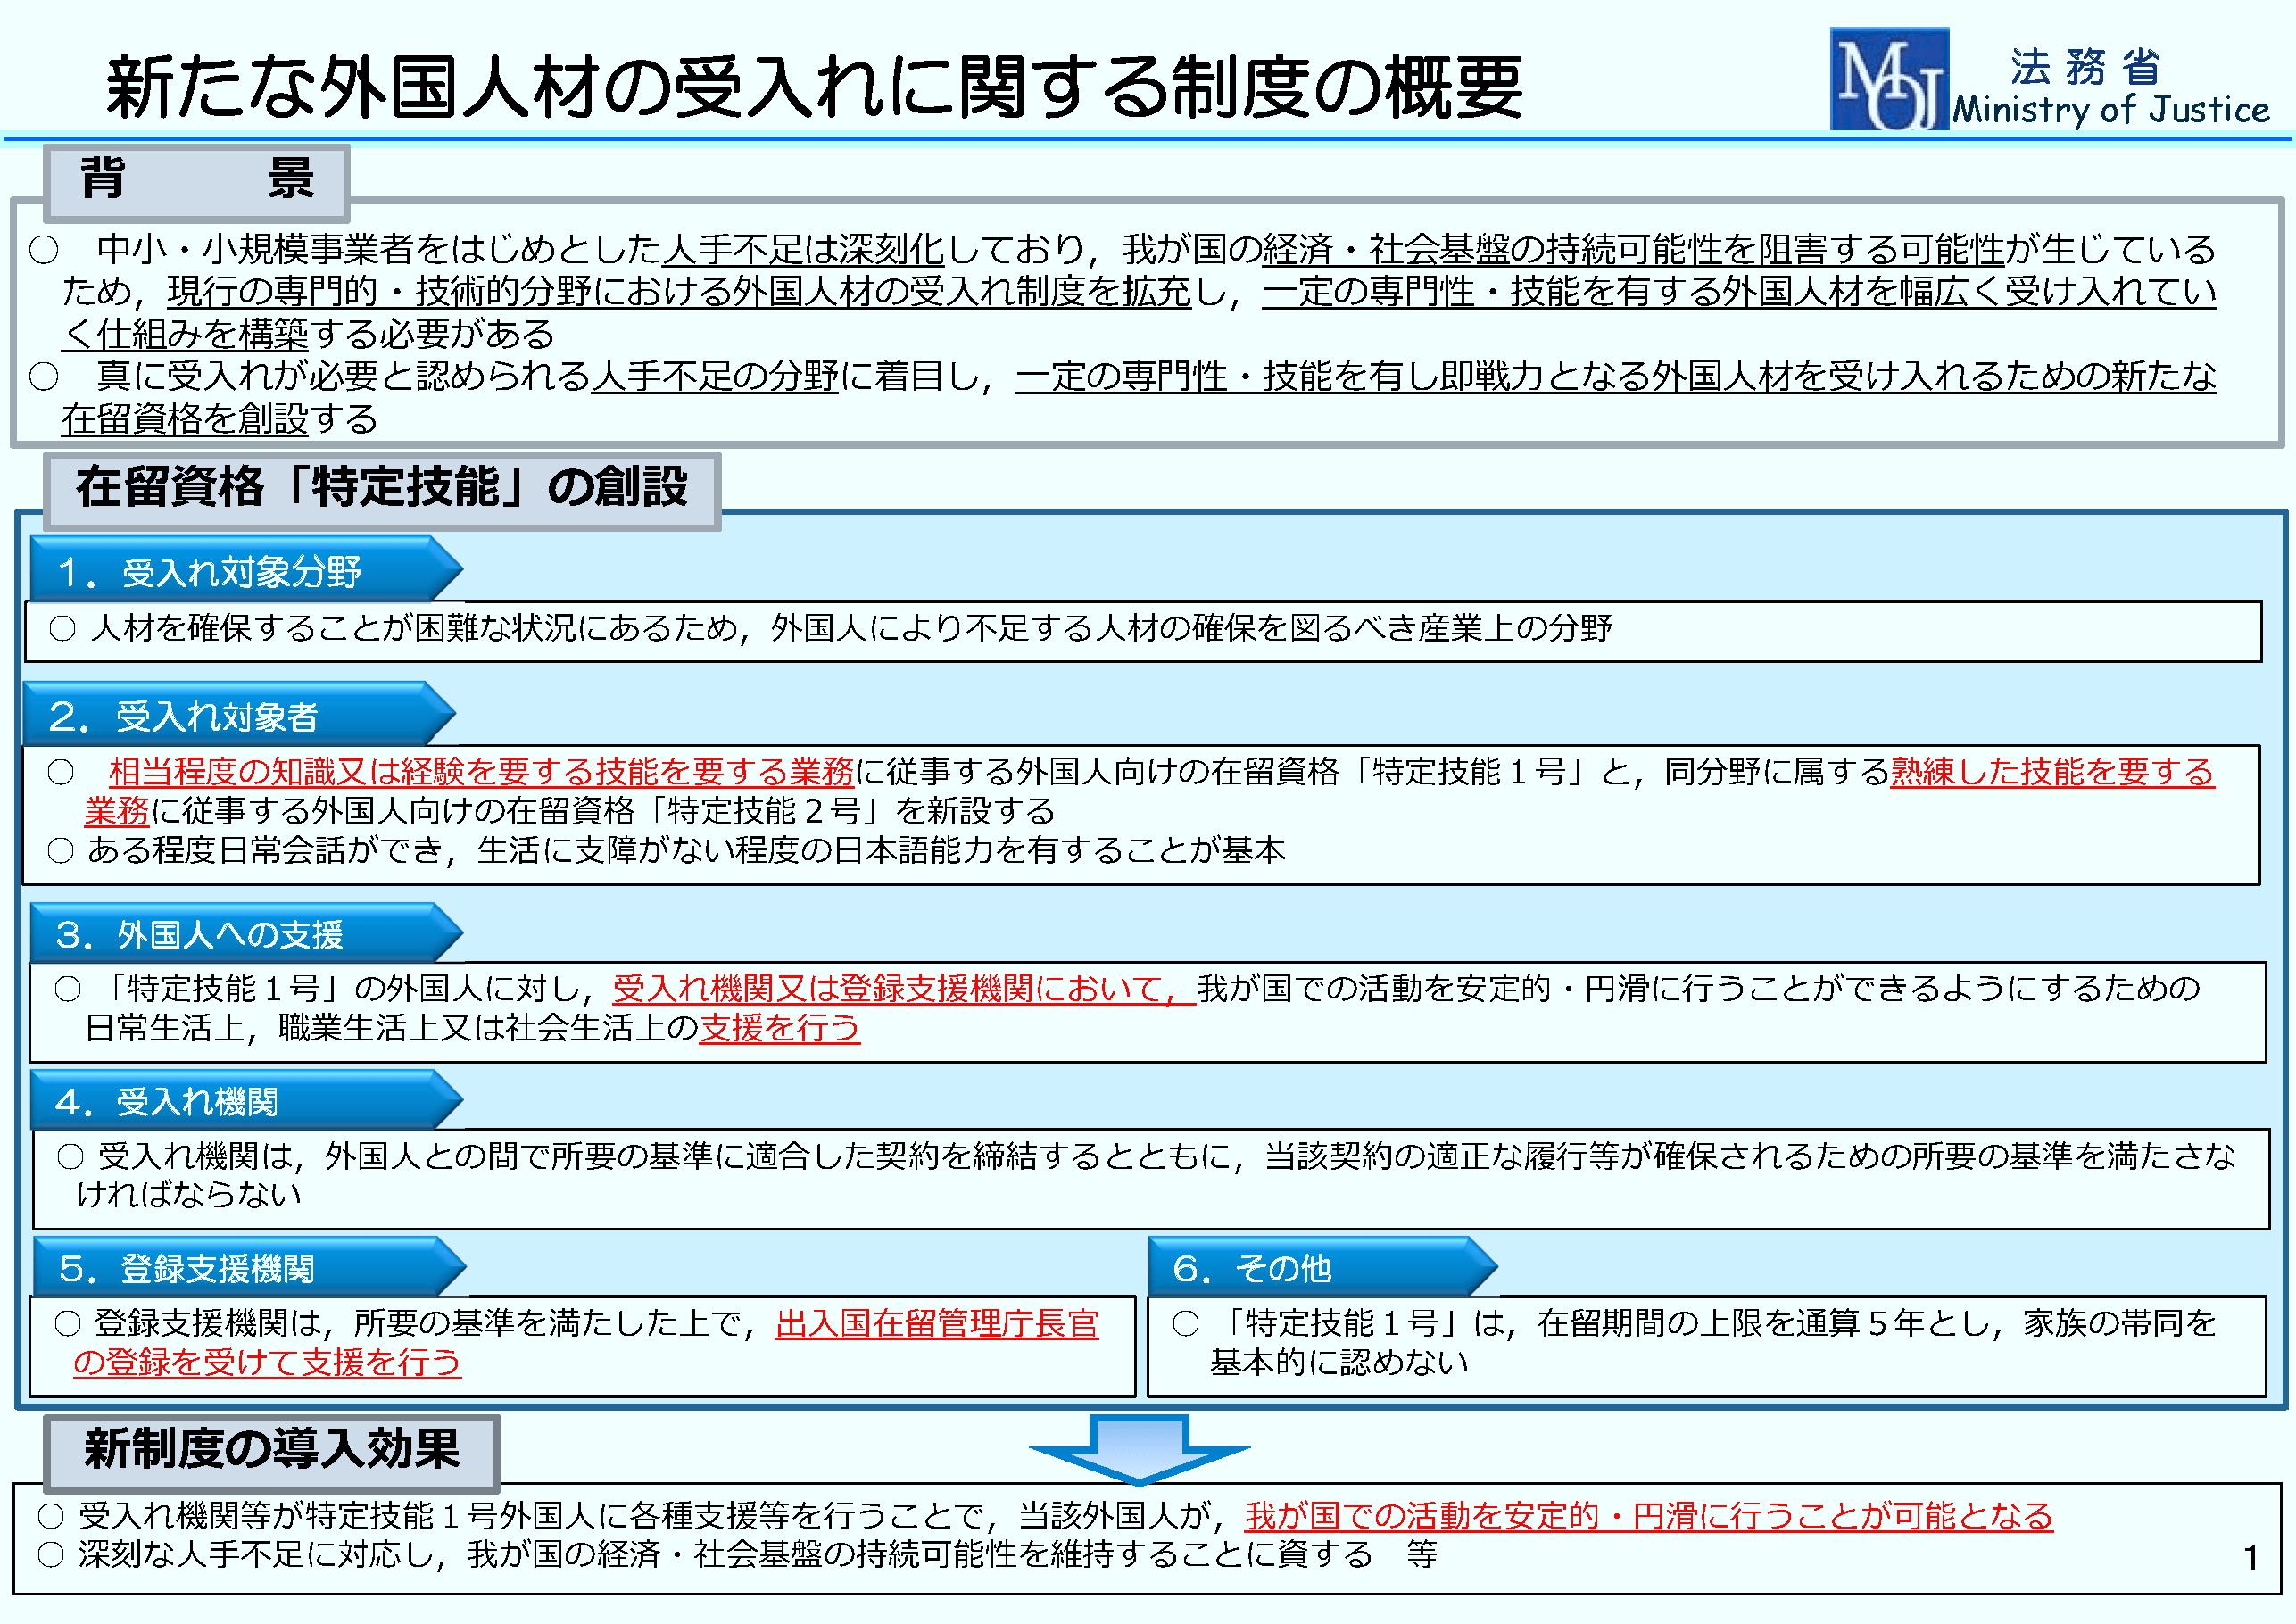 特定技能ビザ(在留資格)資料2-2